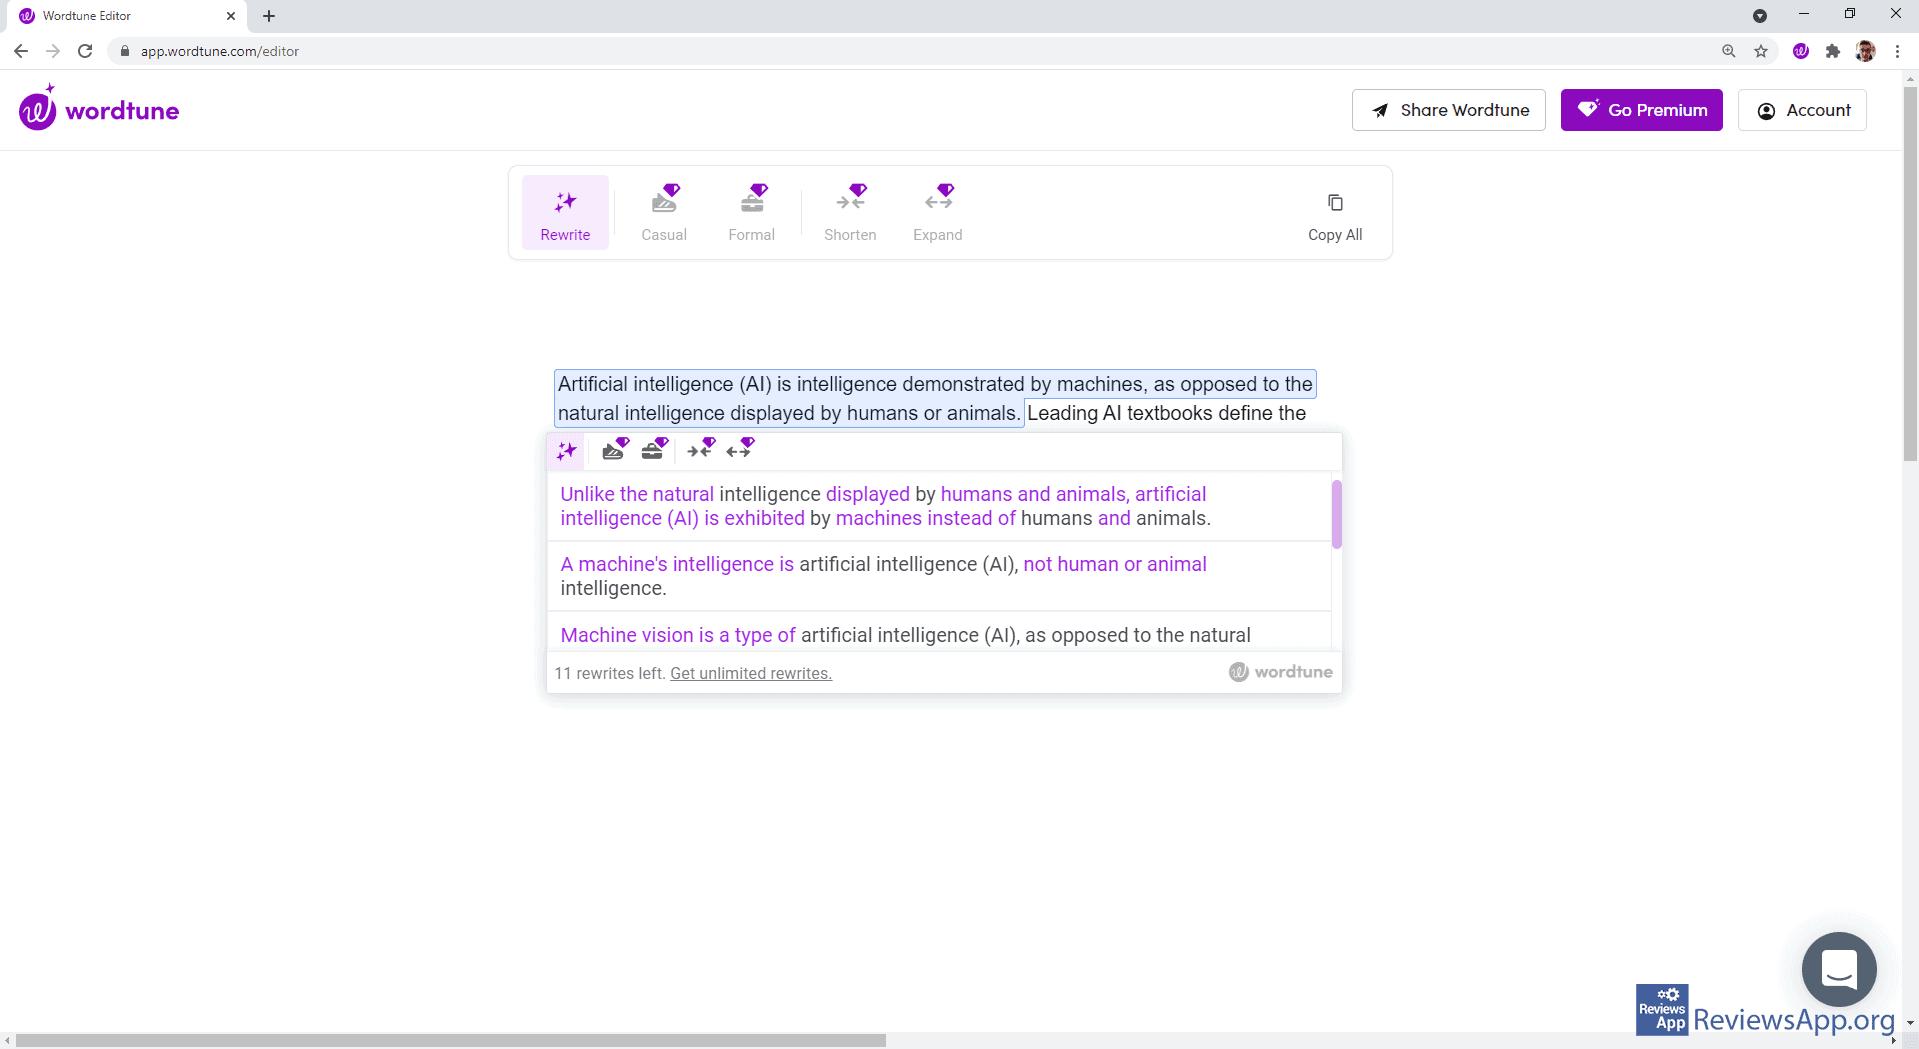 Wordtune in Wordtune Editor